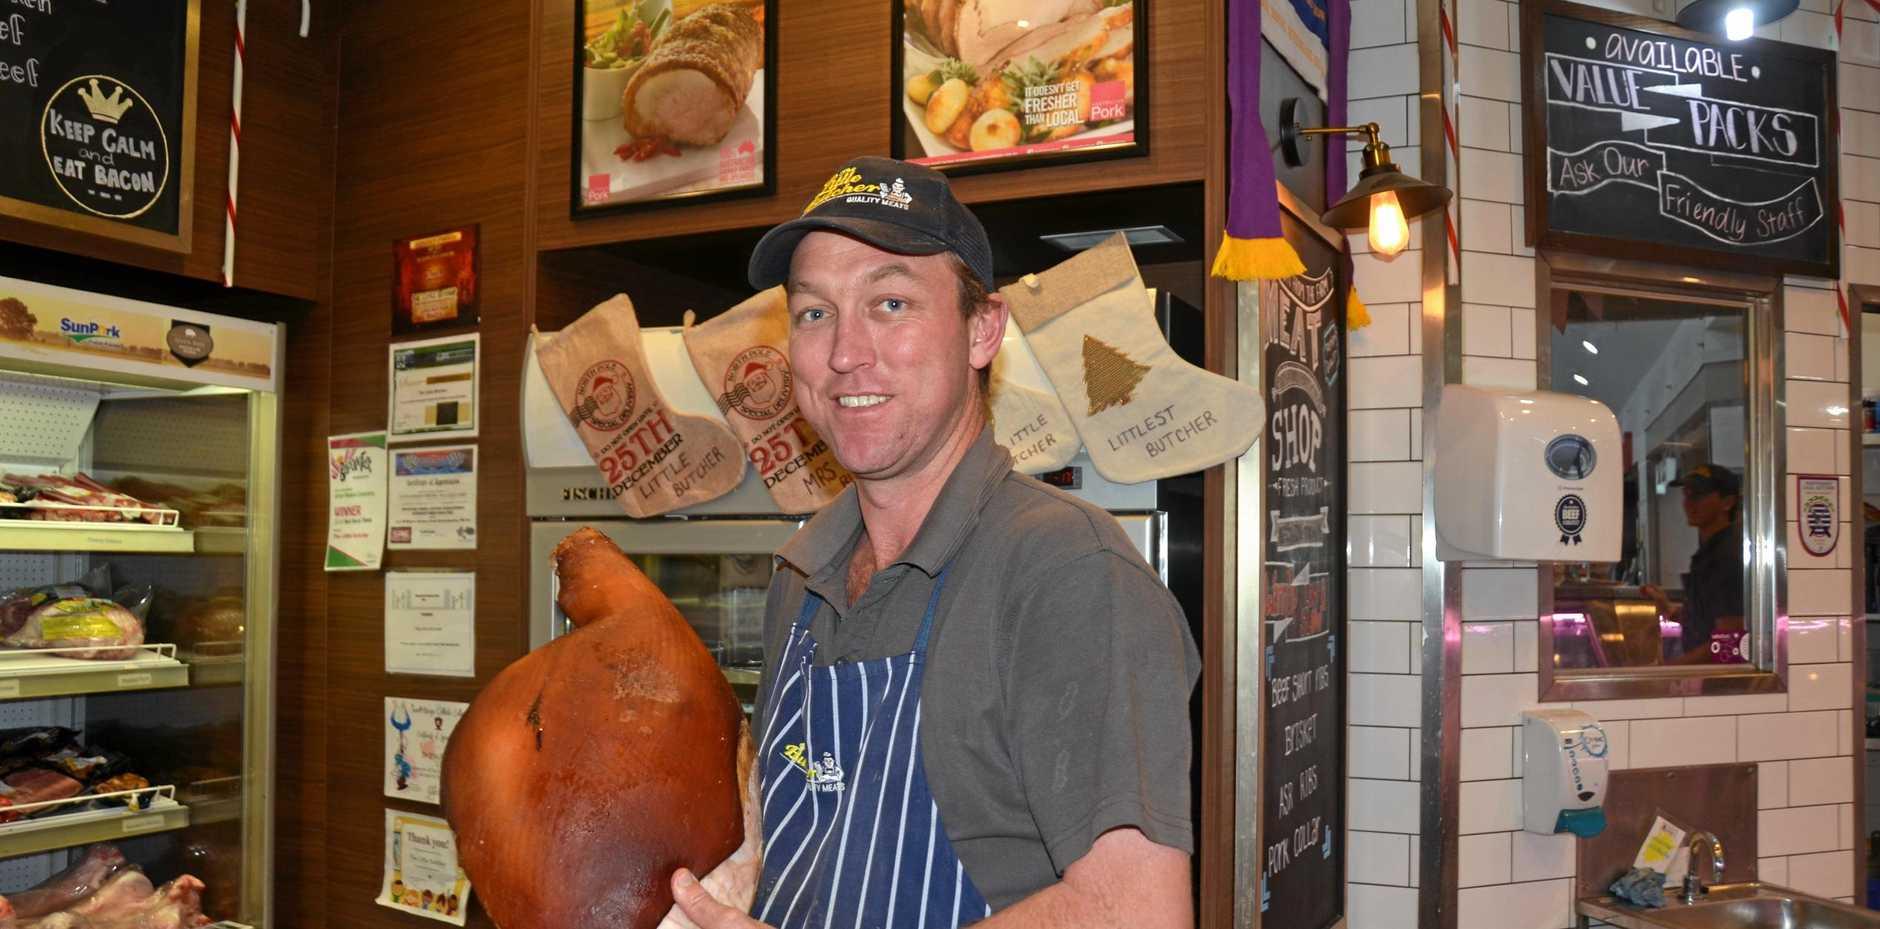 Clinton Stretton parades a Christmas ham prepared by his team at The Little Butcher